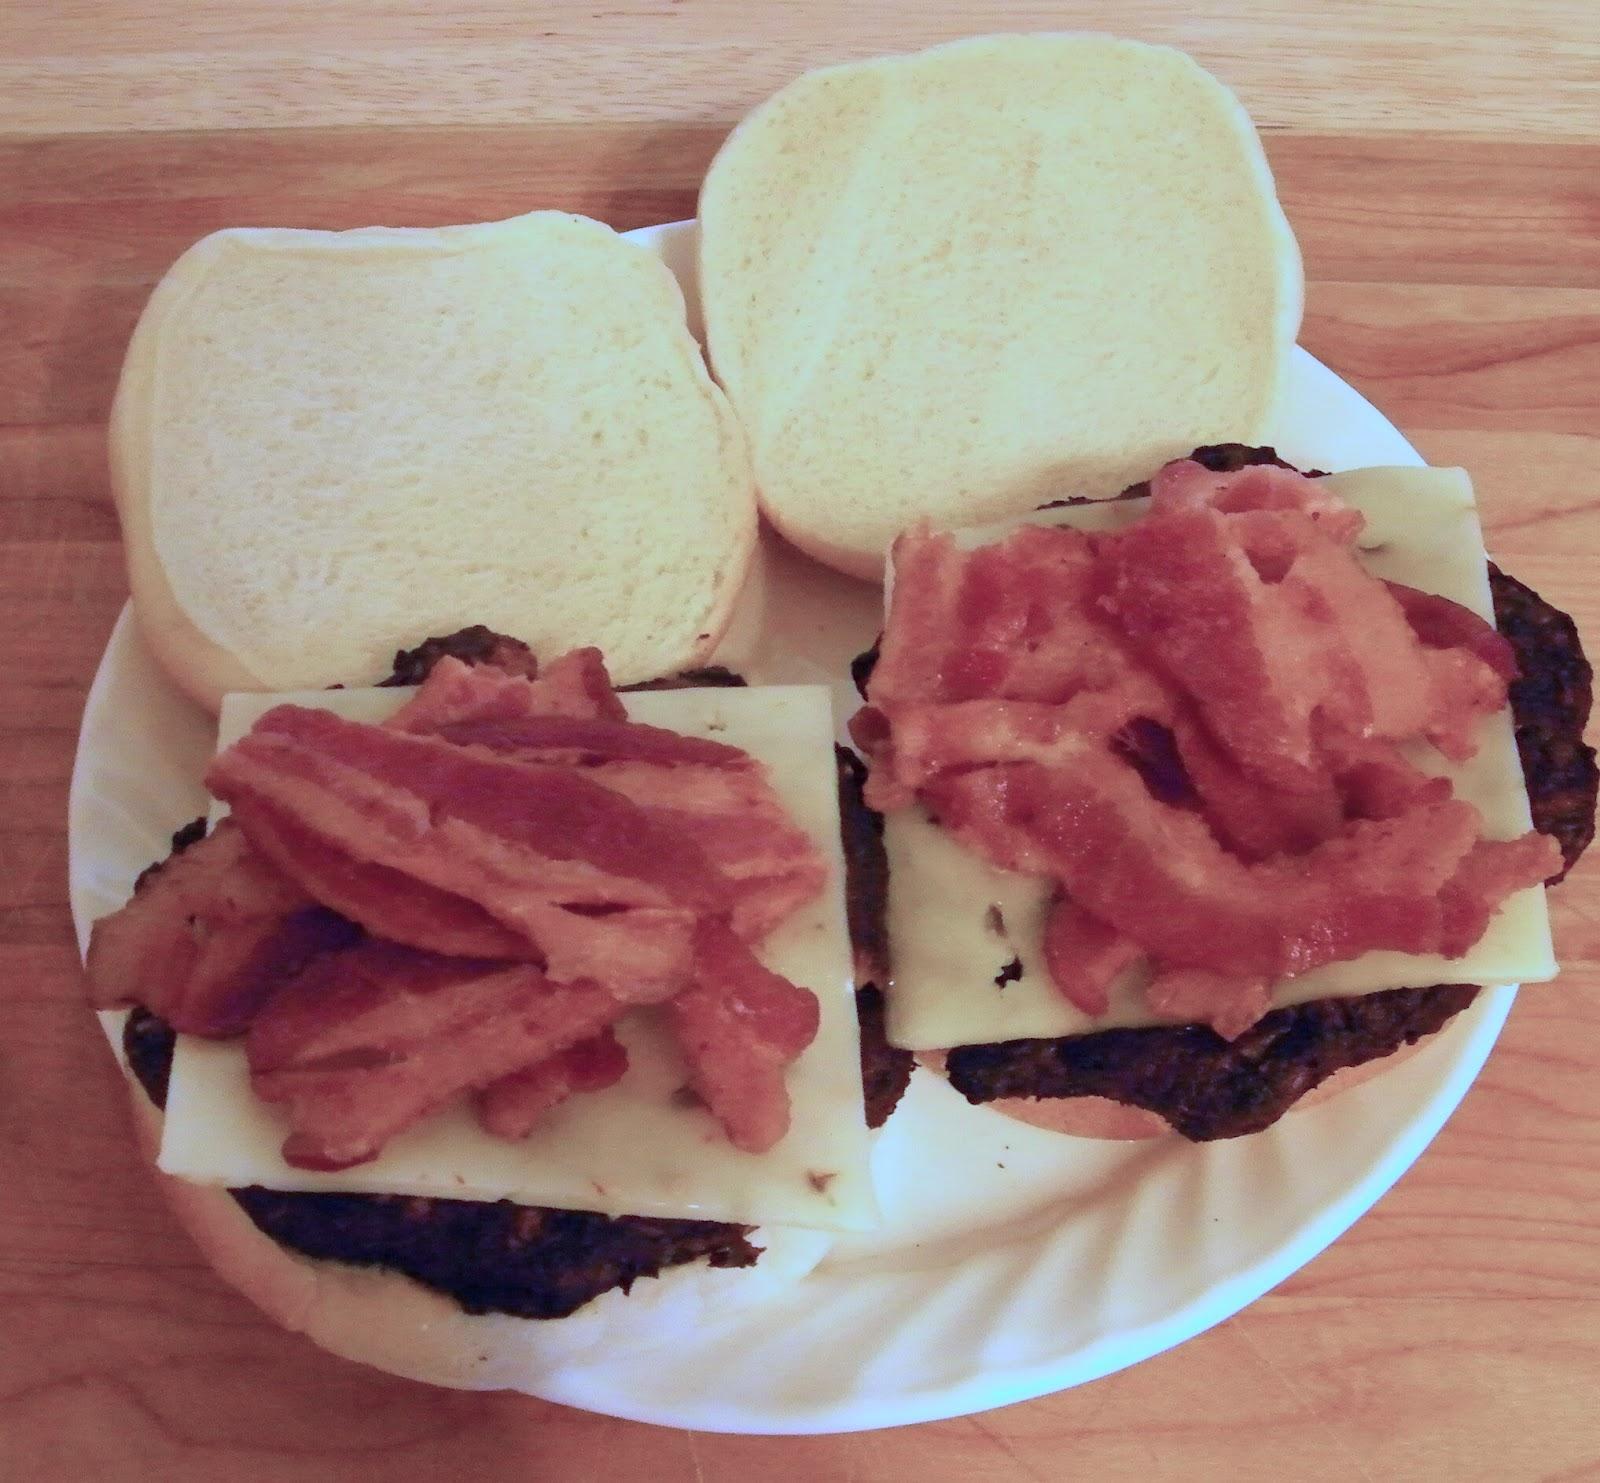 Costco Cuisine: Sacrilegious Black Bean Burger With Bacon ...